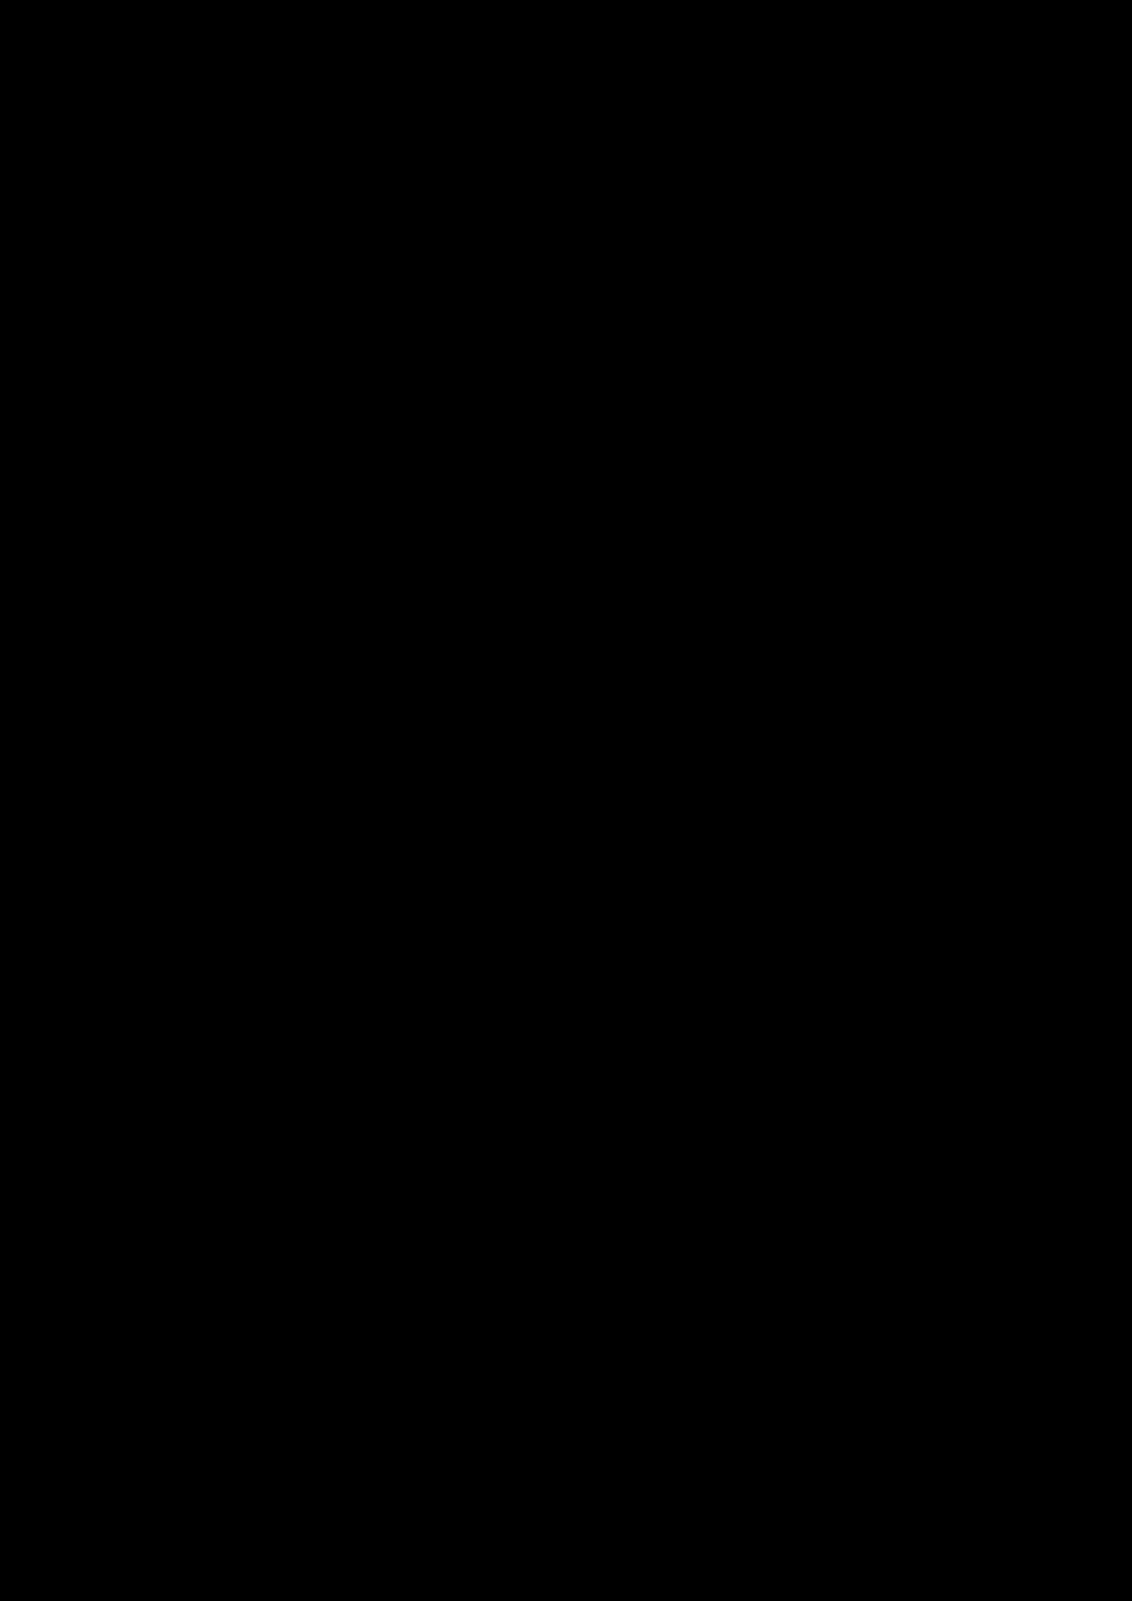 Okean Pustotyi slide, Image 6